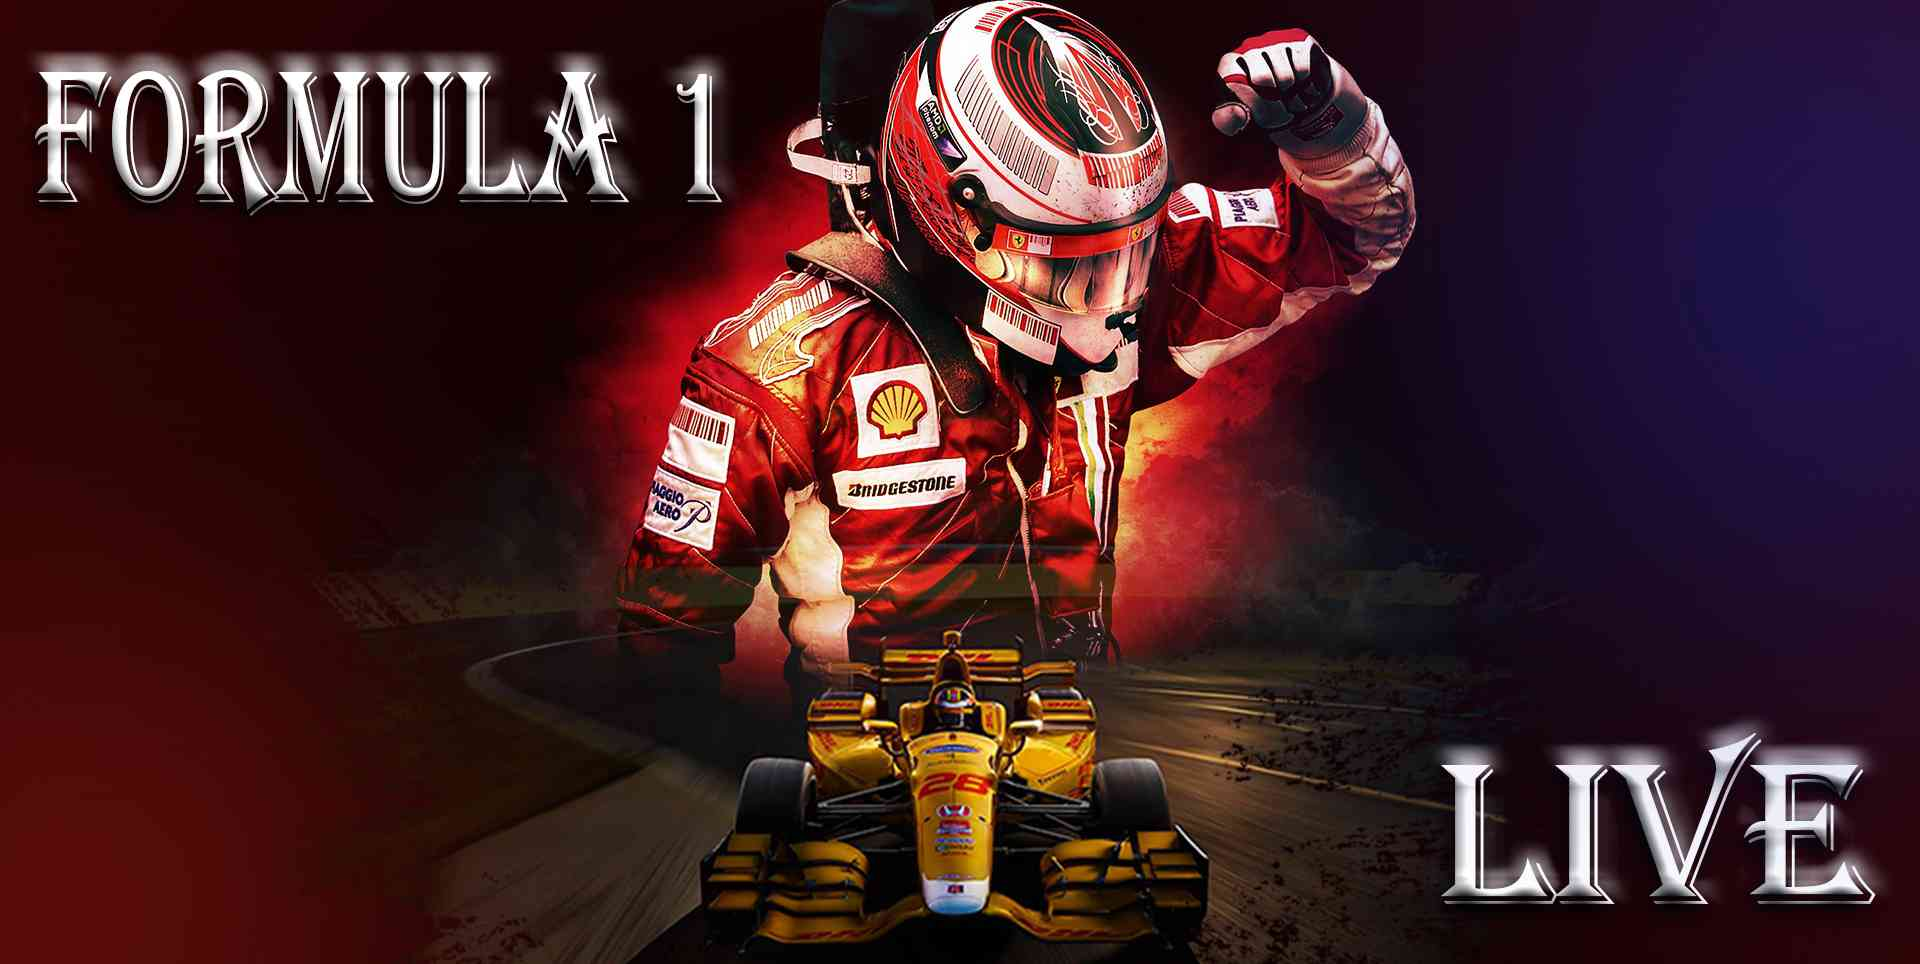 2015-italian-grand-prix-f1-race-live